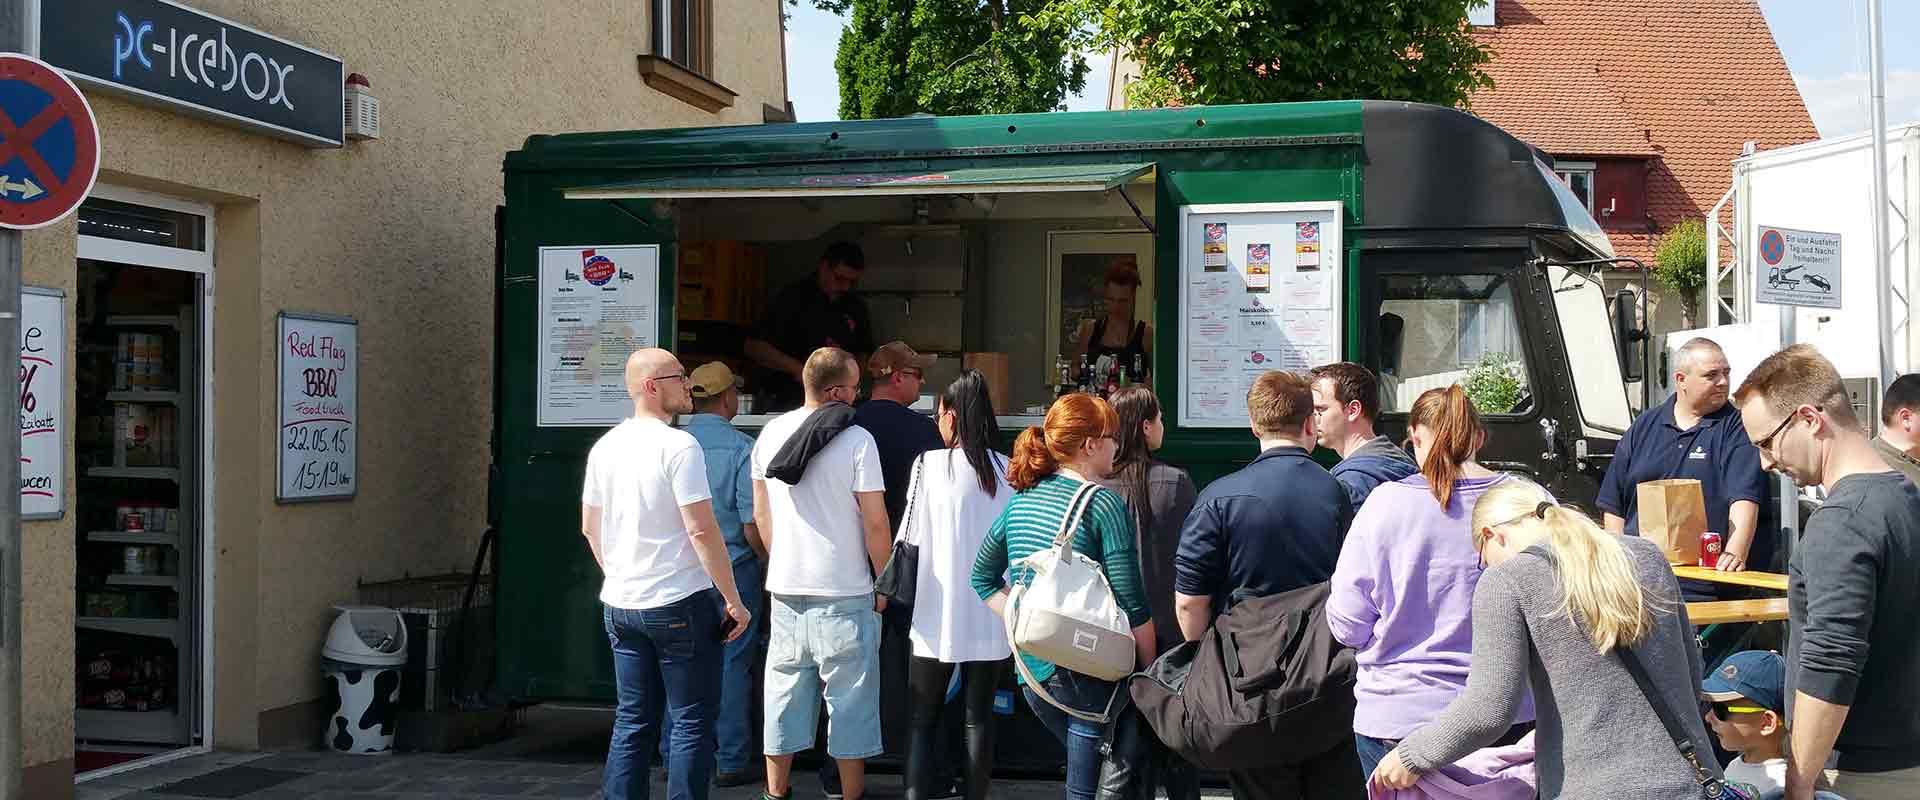 Foodtruck Standort PC-IceBOX